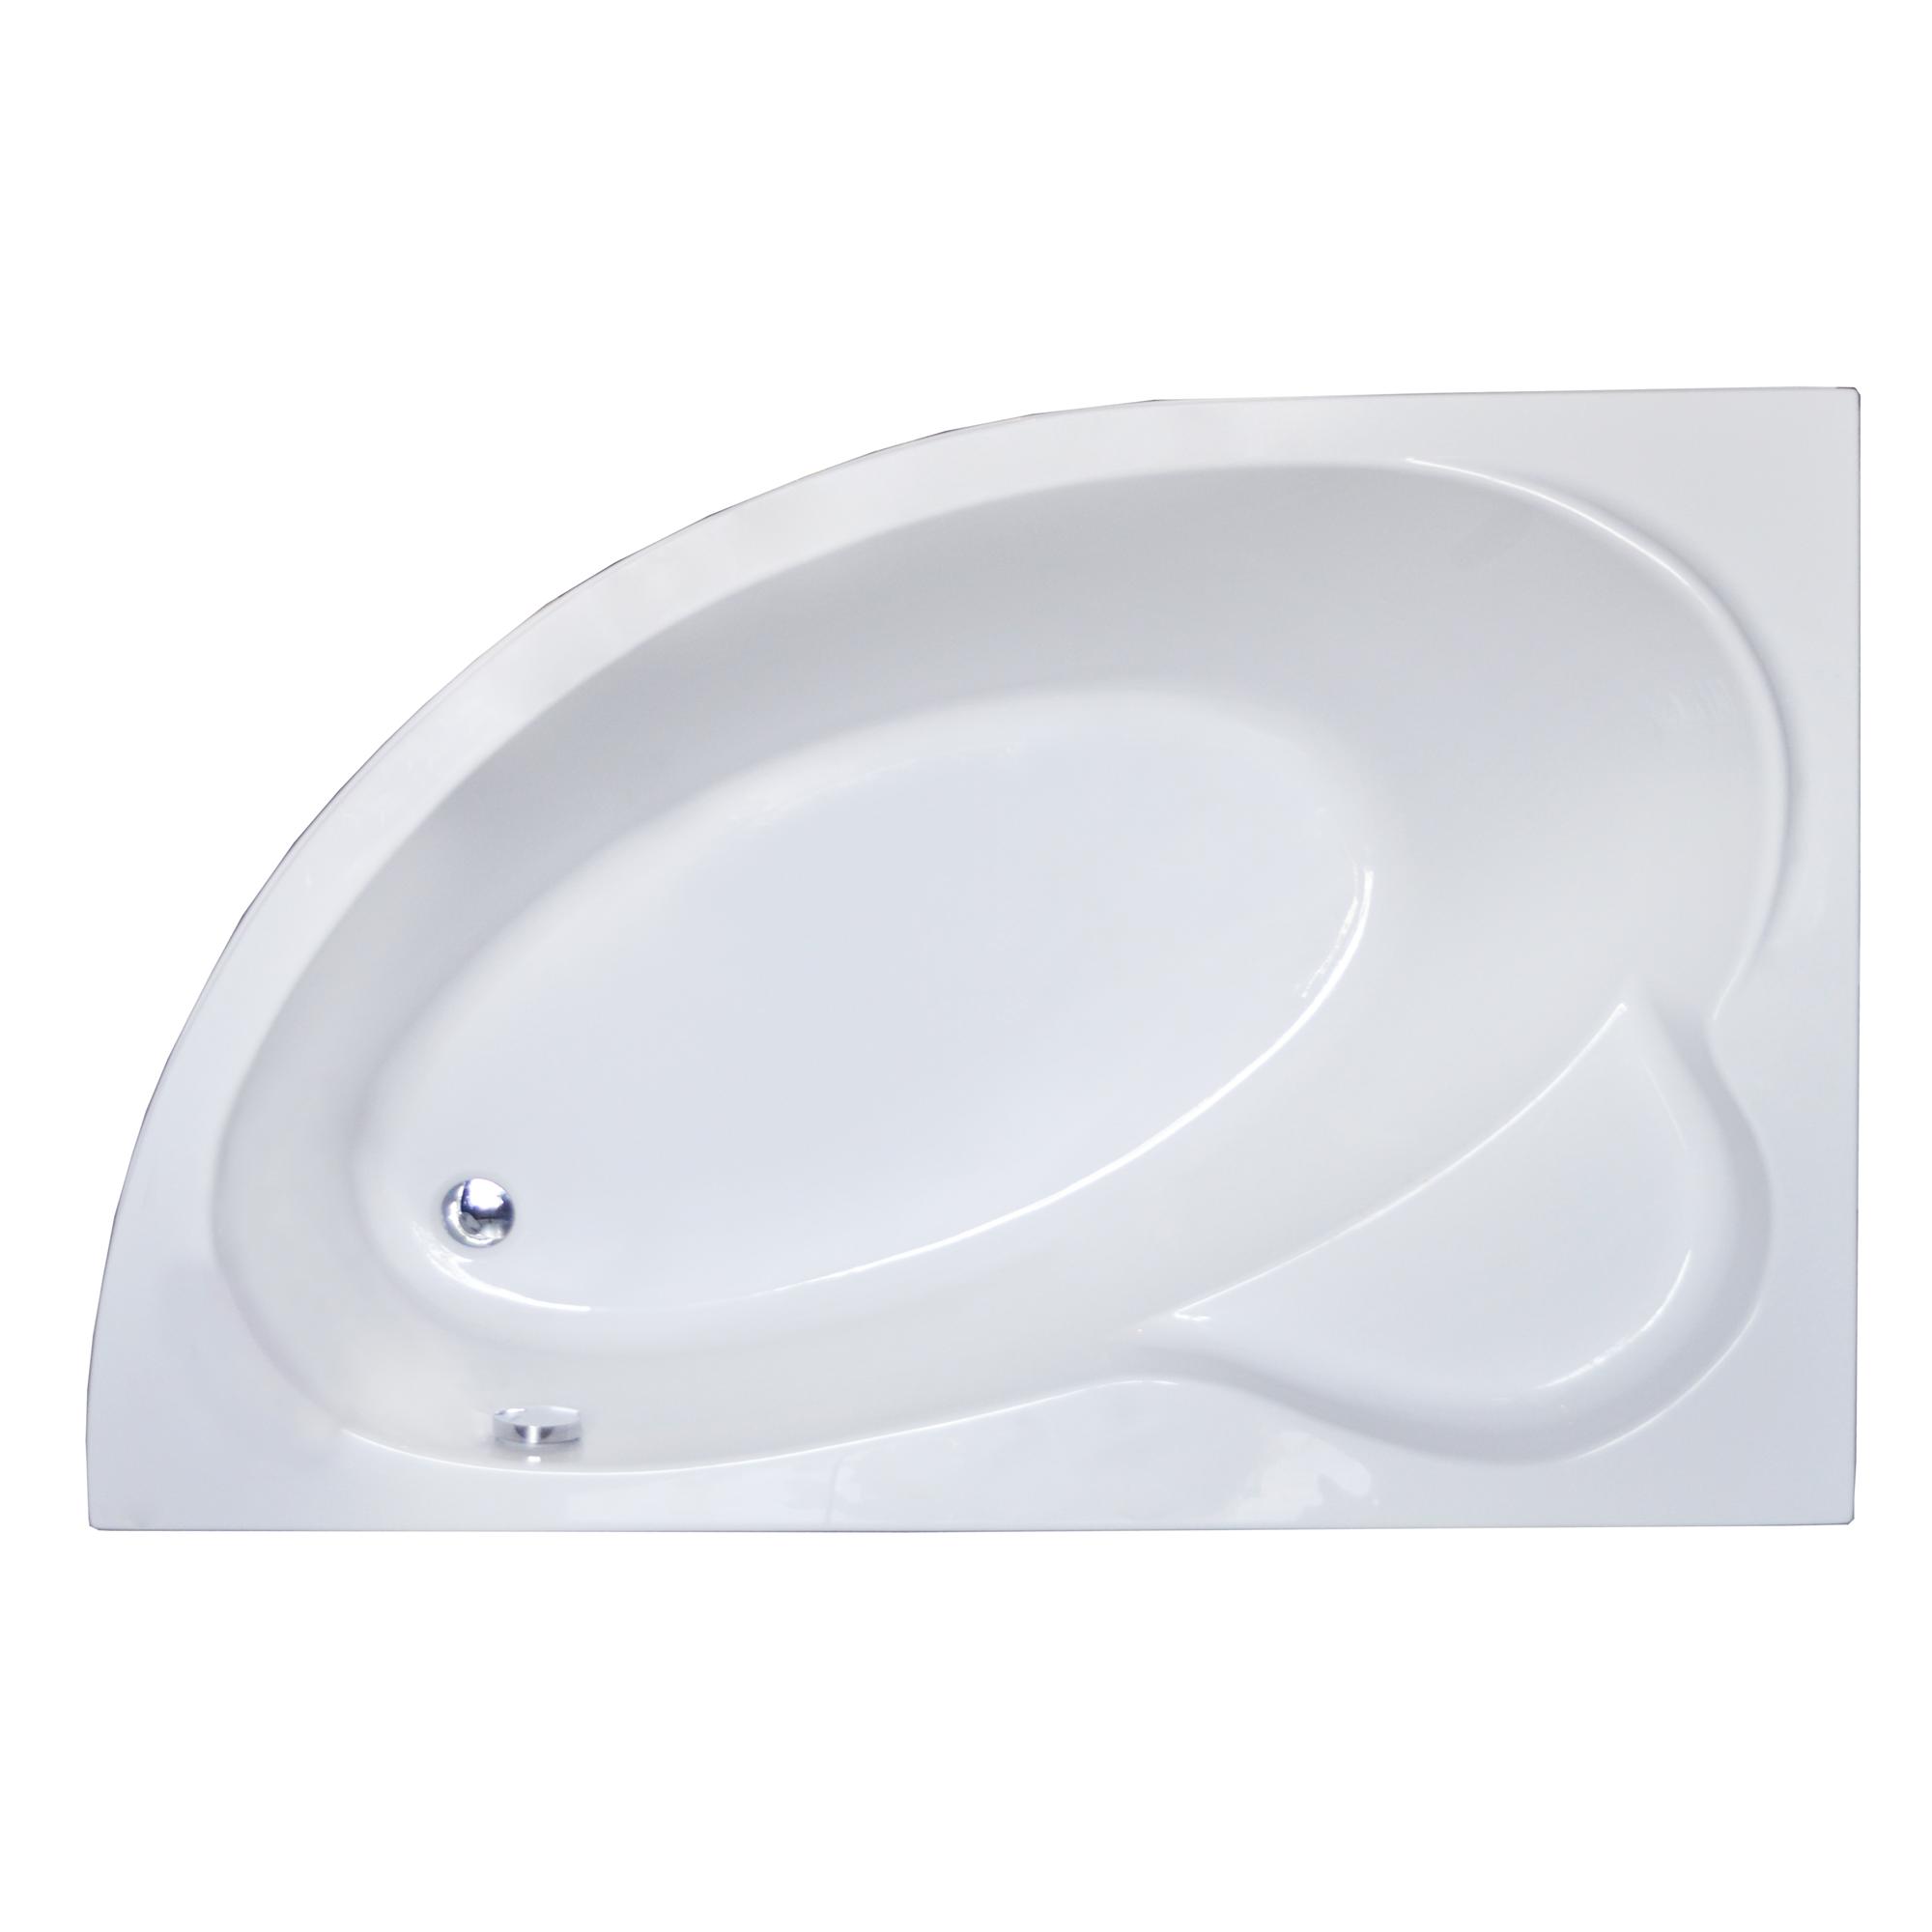 Акриловая ванна Royal bath Alpine RB819101 160х100 L панель фронтальная к ванне royal bath alpine 170 rb819102p